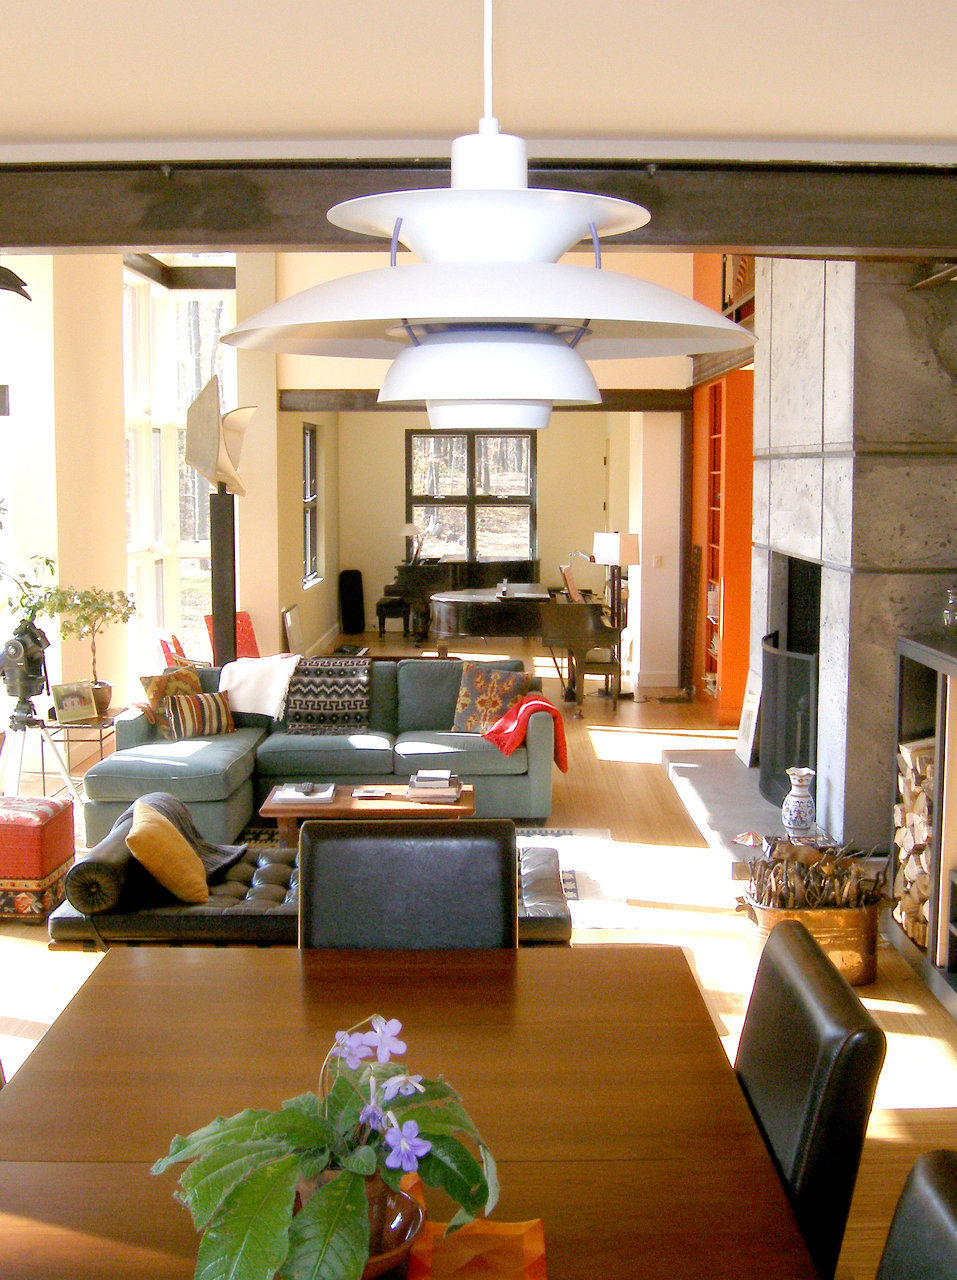 talbot house bca living room furniture